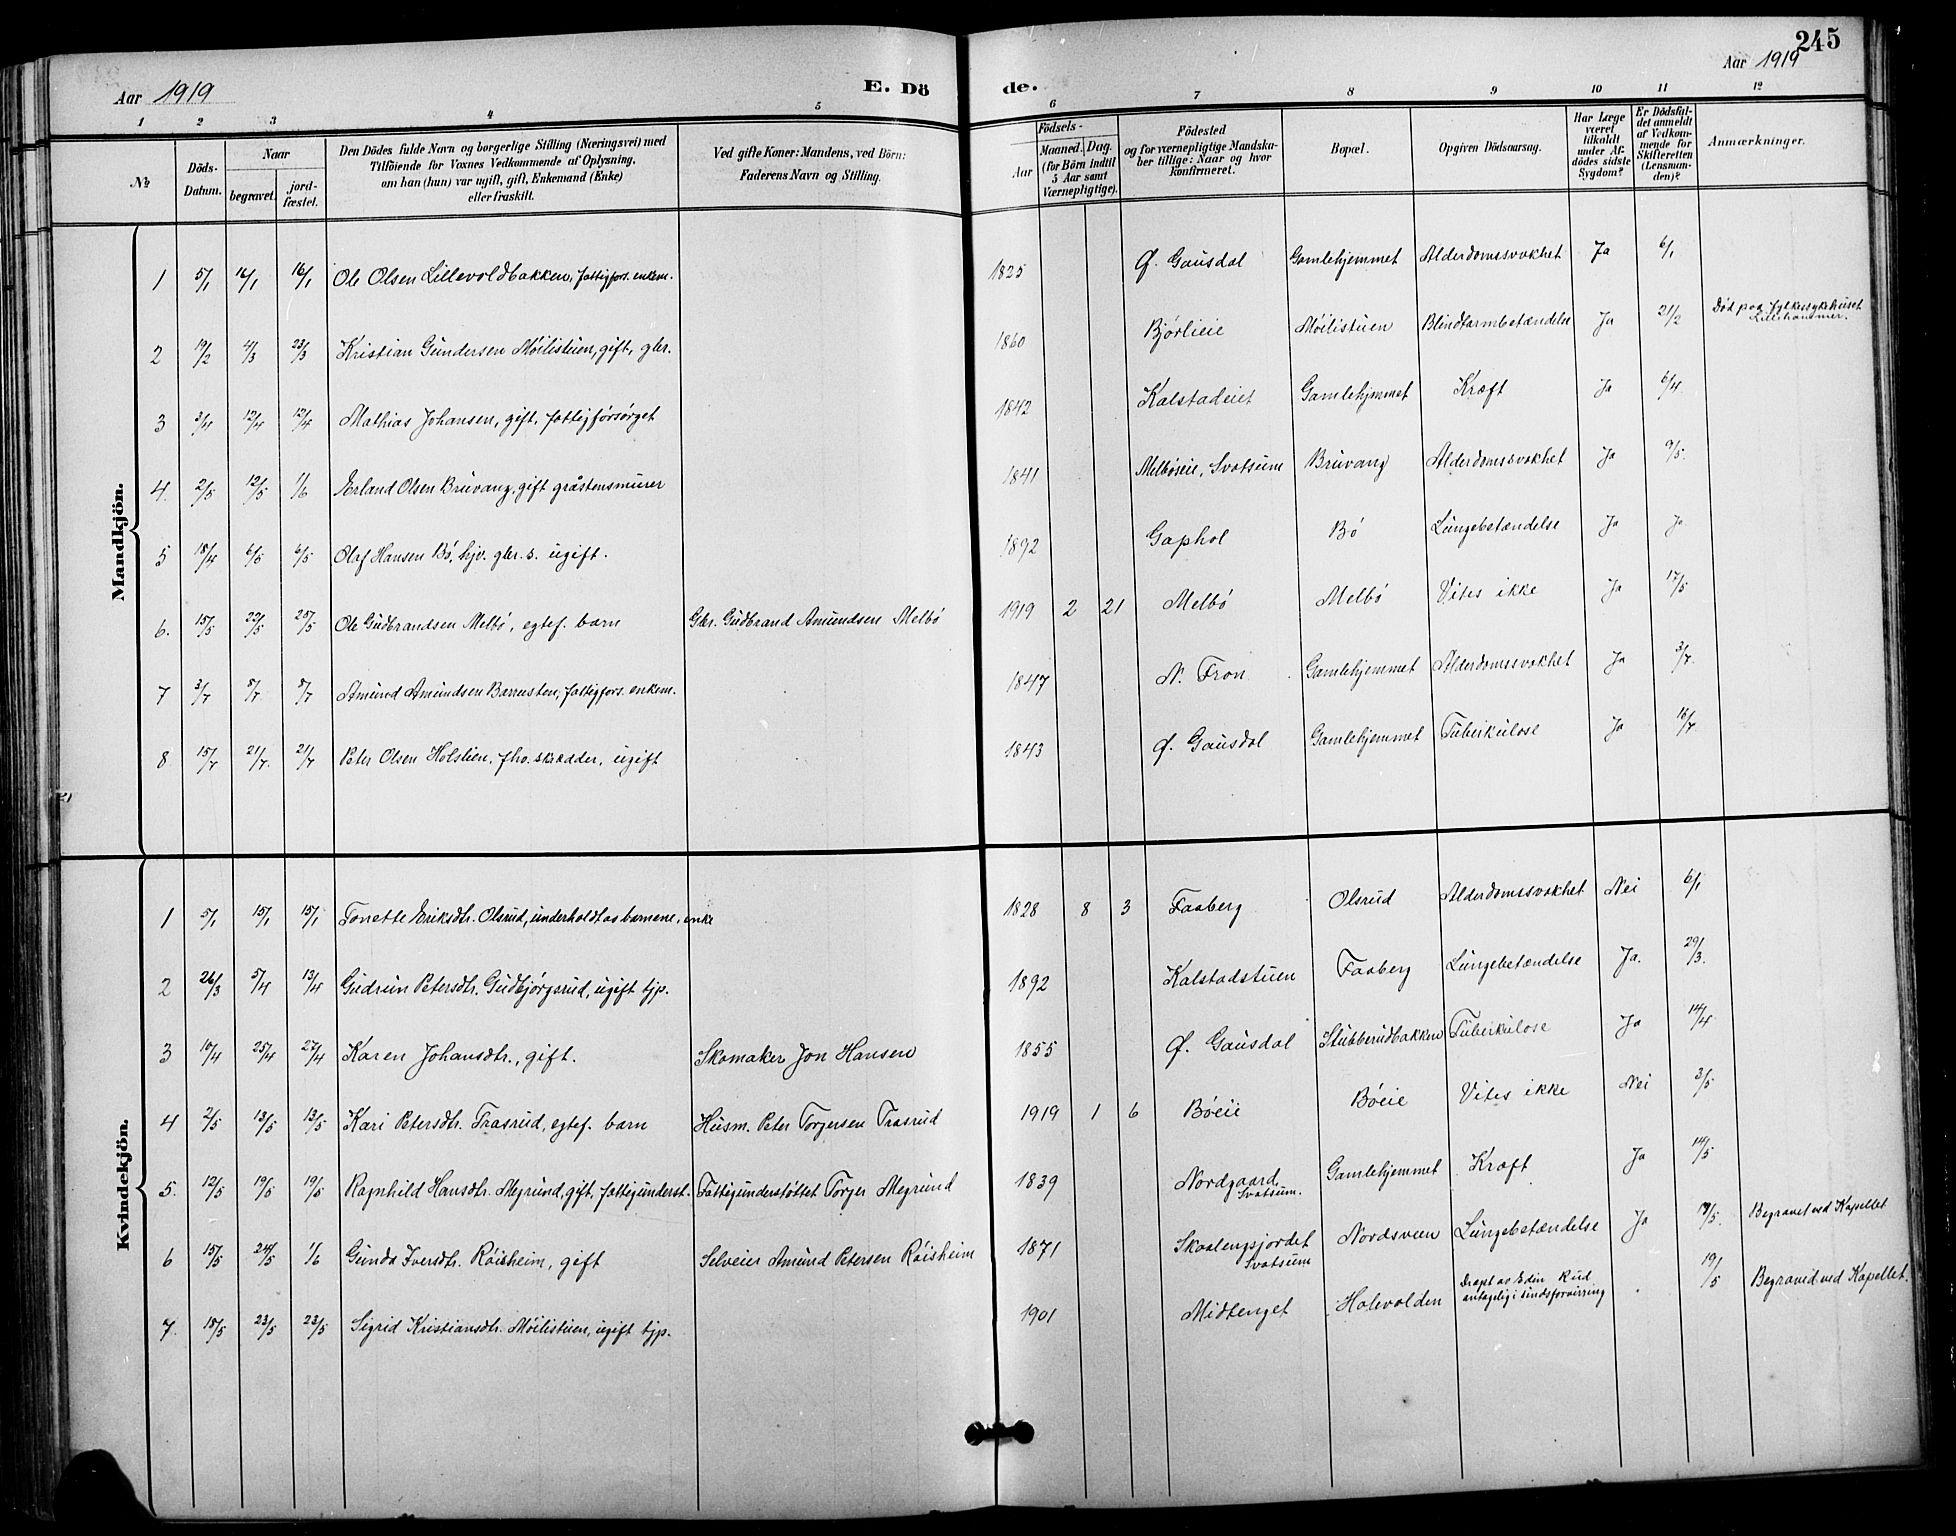 SAH, Vestre Gausdal prestekontor, Klokkerbok nr. 3, 1896-1925, s. 245